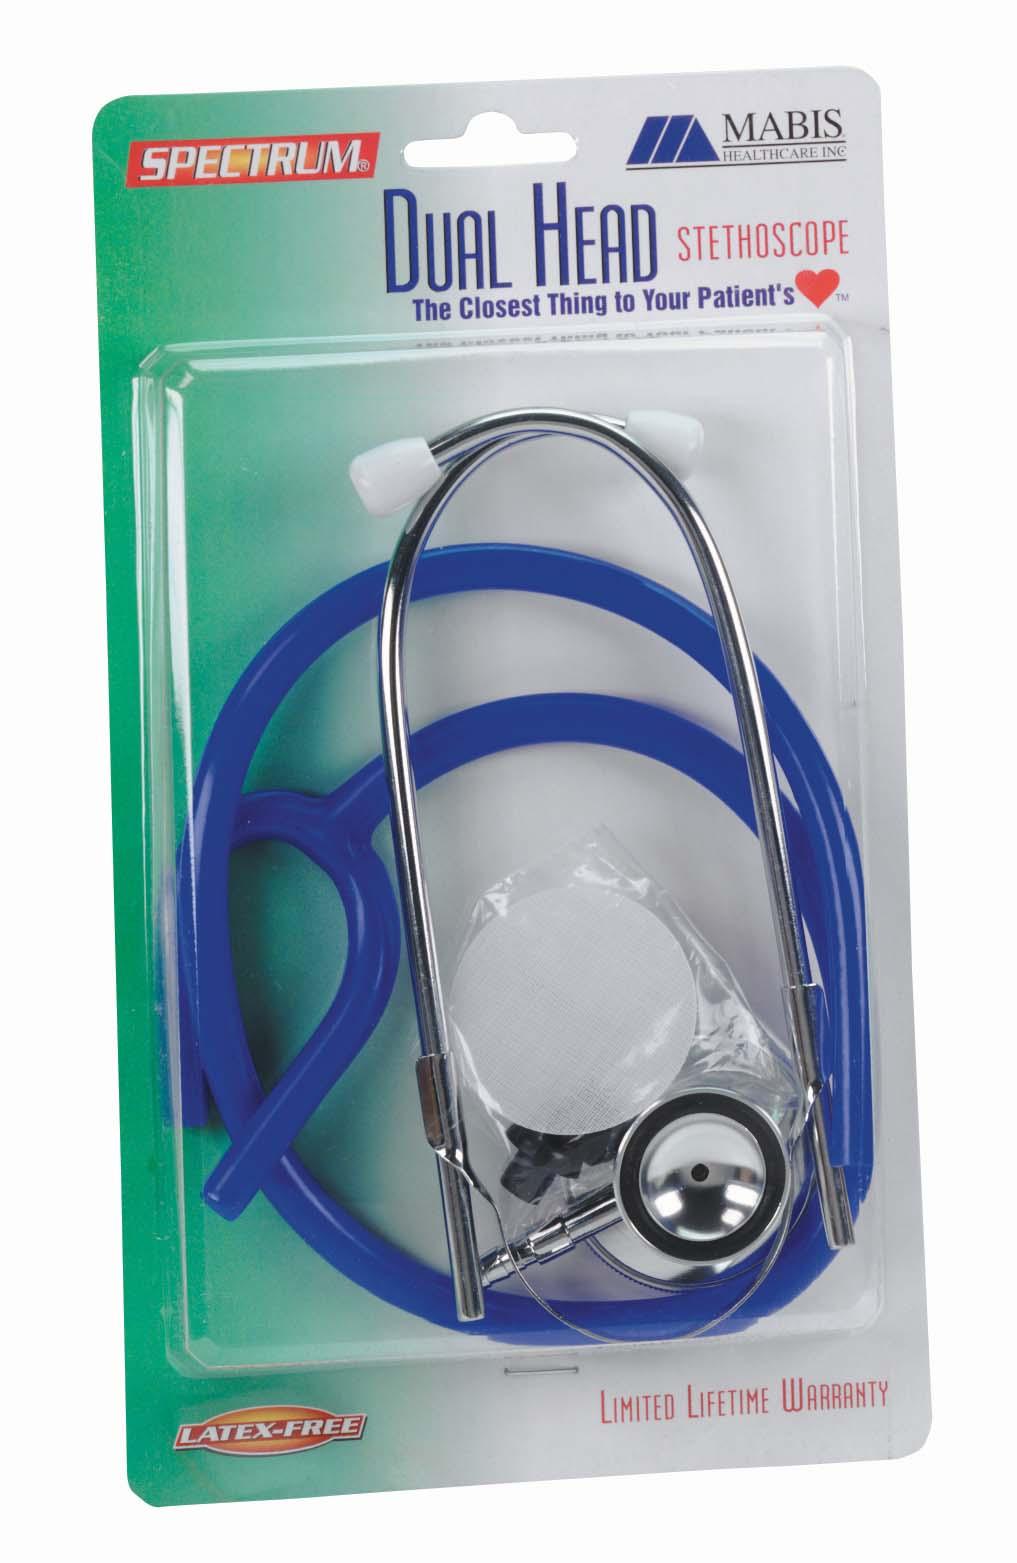 spectrum-dual-head-stethoscope-adult-slider-pack-gray-10-429-030-lr.jpg